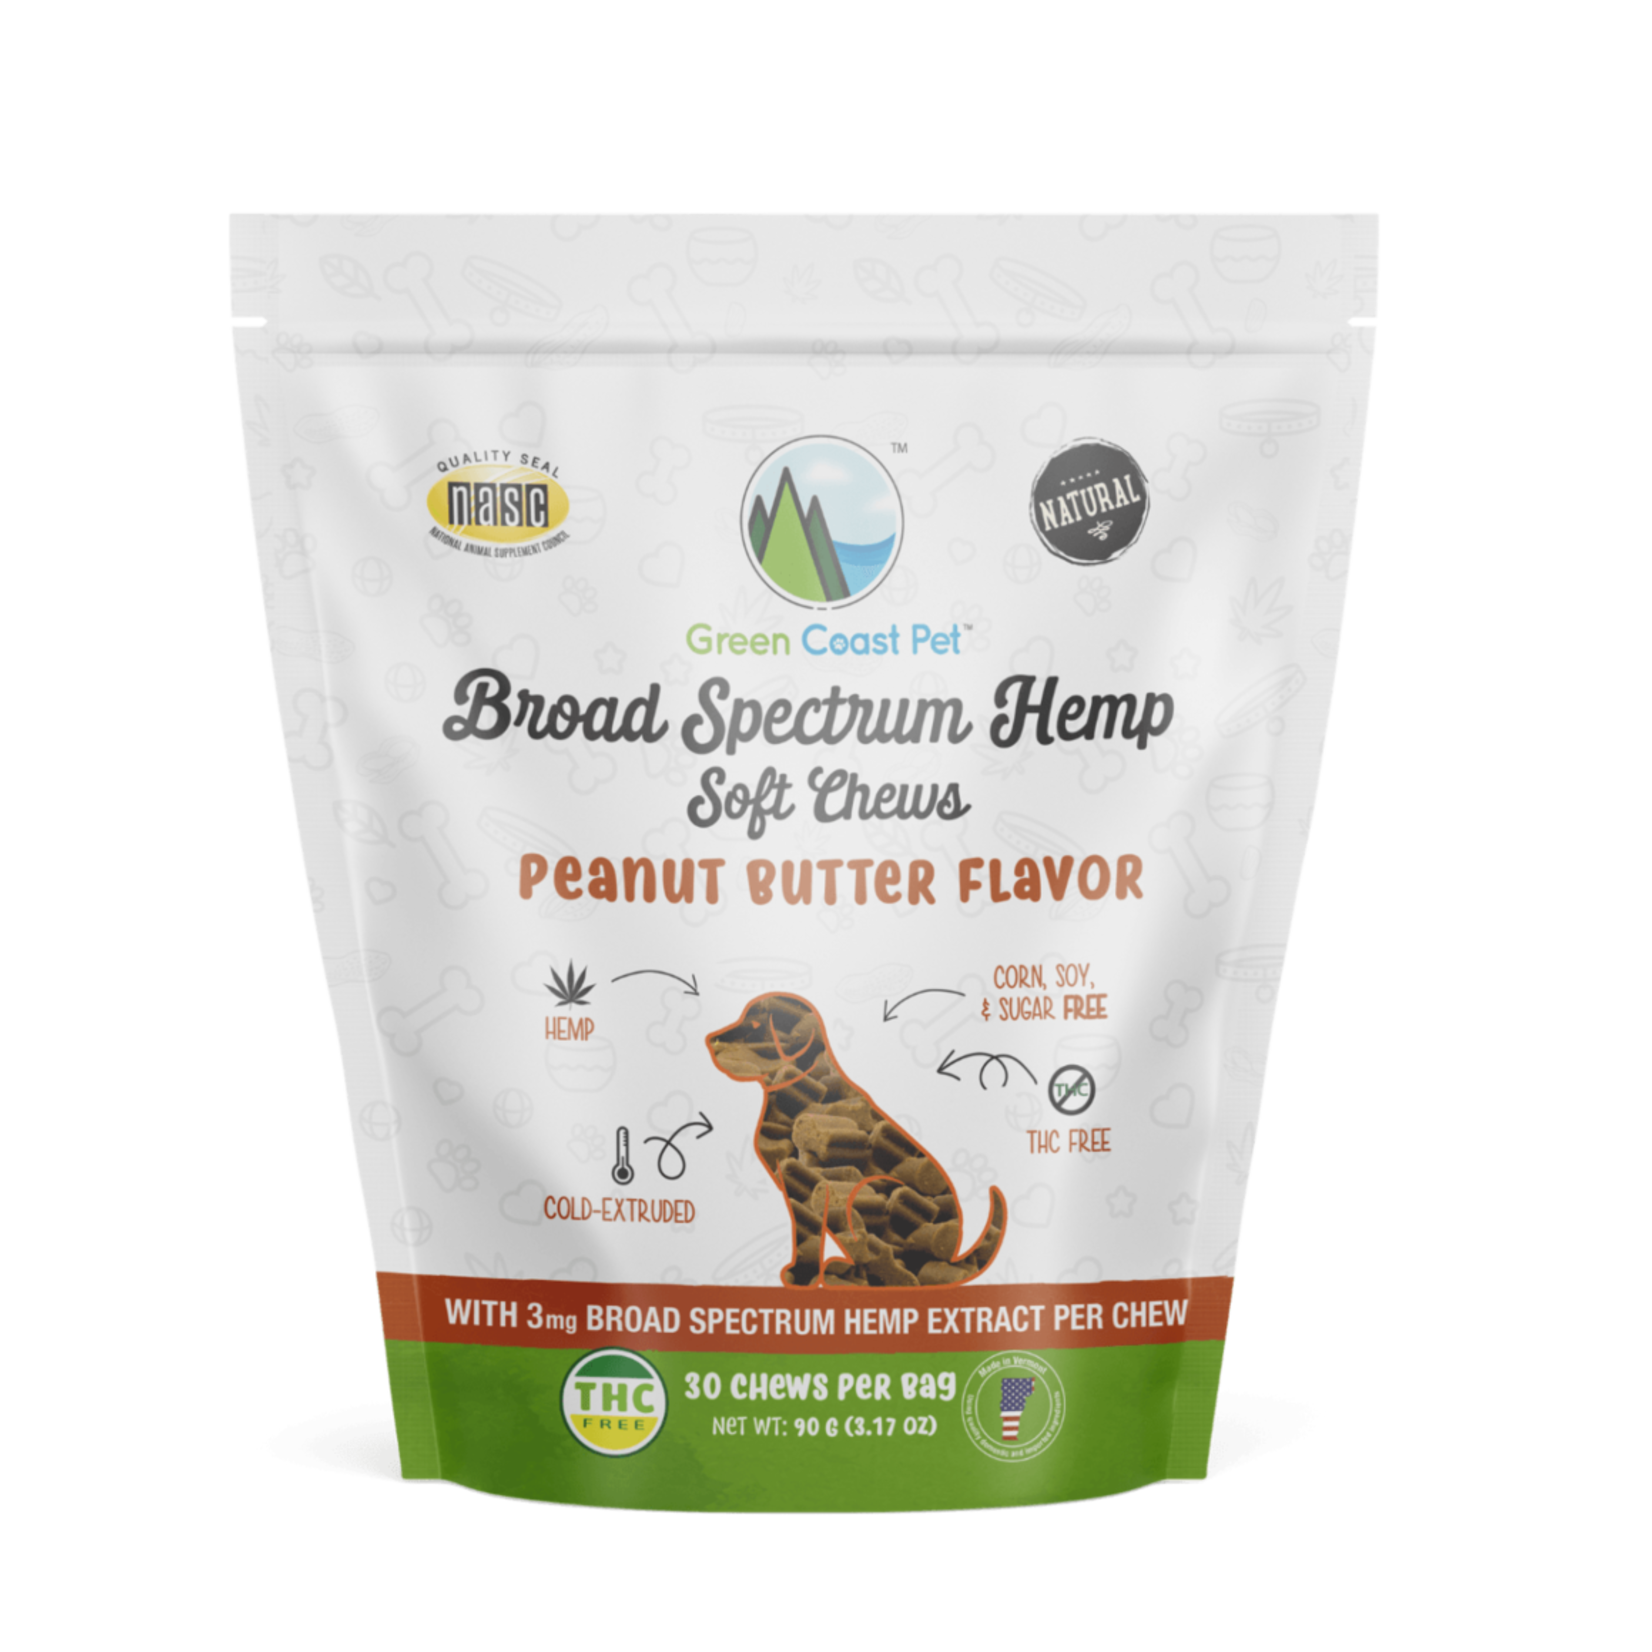 Green Coast Pet Green Coast Pet Dog Full-Spectrum Hemp Soft Chews Peanut Butter 30 Count